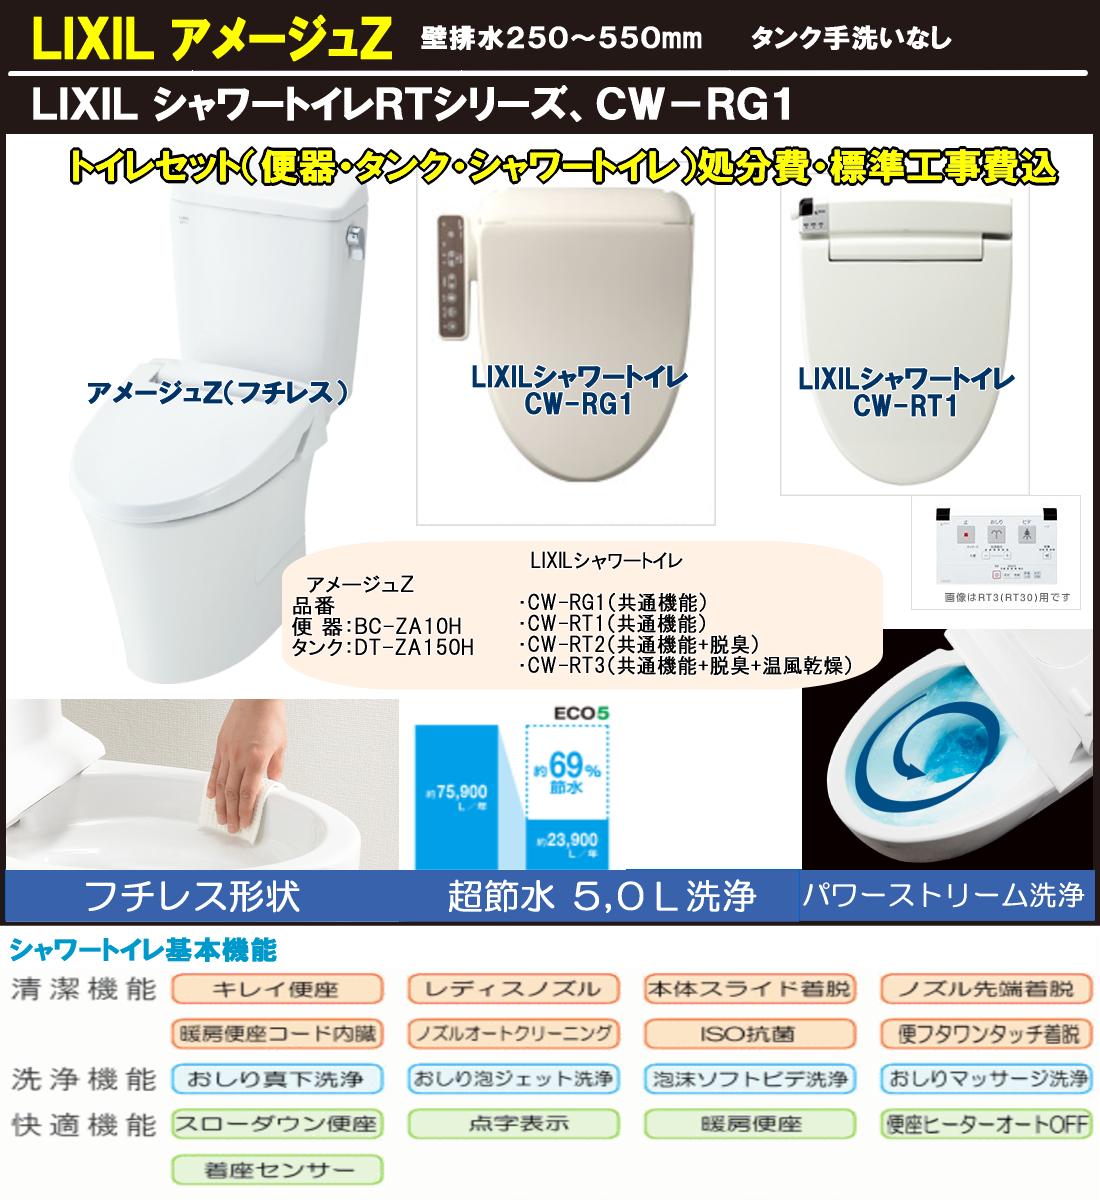 LIXILトイレ交換リフォーム